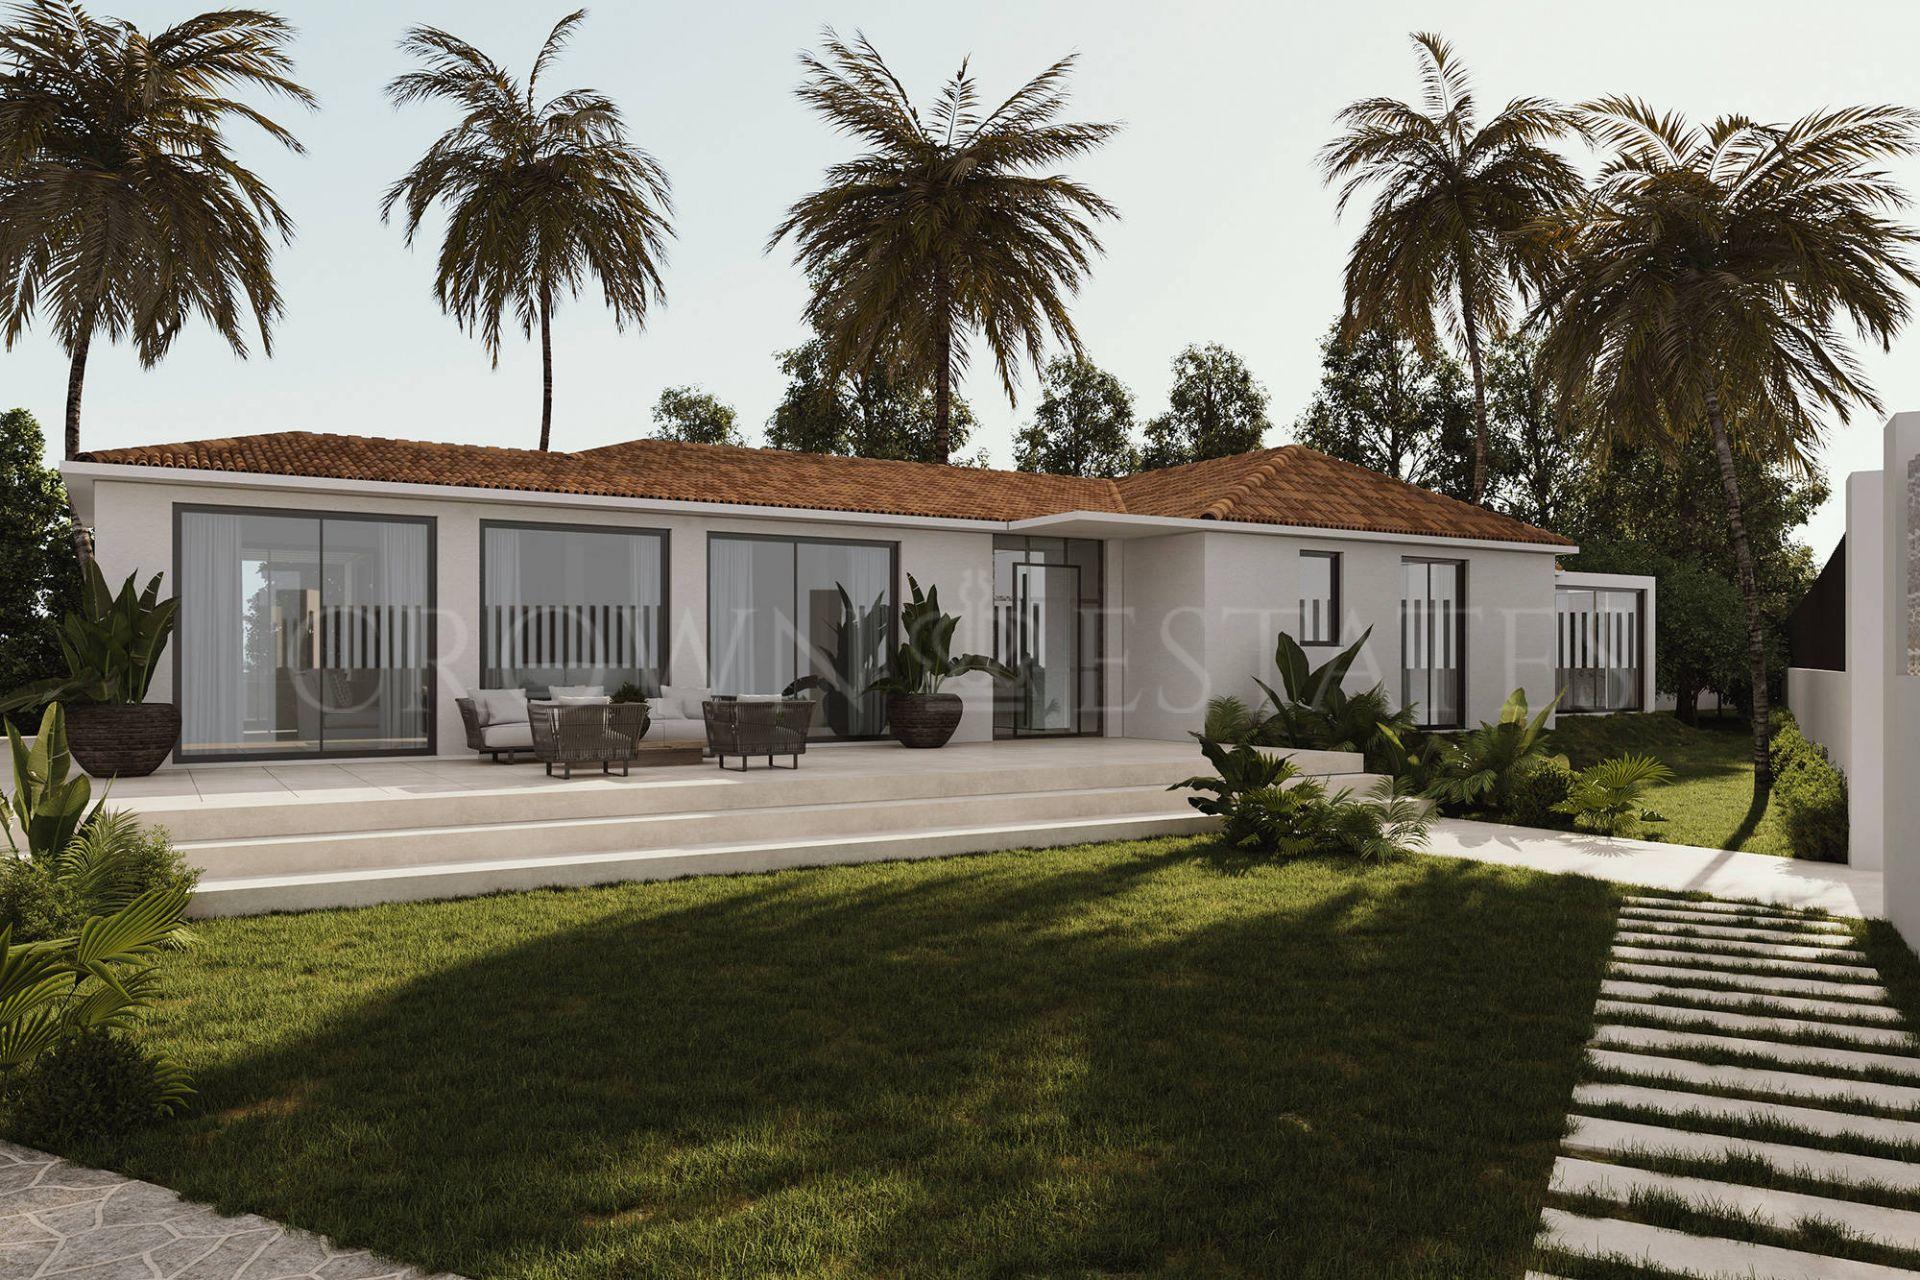 Completely Refurbrished Villa in Nueva Andalucía!